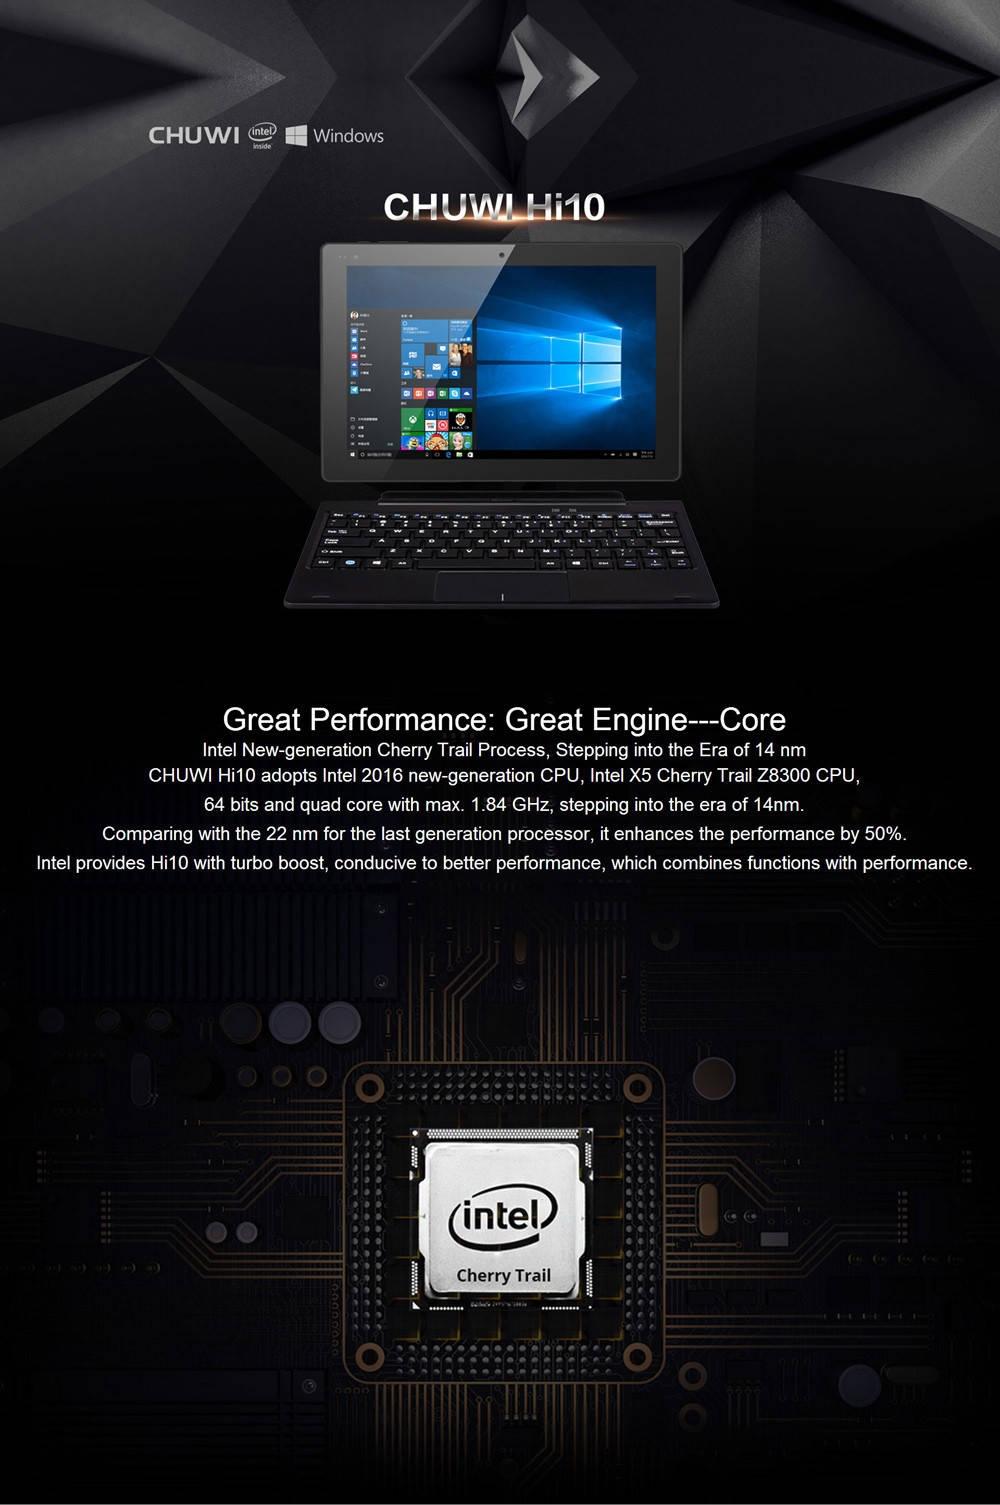 10.1 inch Chuwi Hi10 Windows 10 + Android 5.1 Ultrabook Tablet PC Intel Cherry Trail Z8300 64bit Quad Core 1.44GHz IPS Retina Screen 4GB RAM 64GB ROM WiFi HDMI Bluetooth 4.0